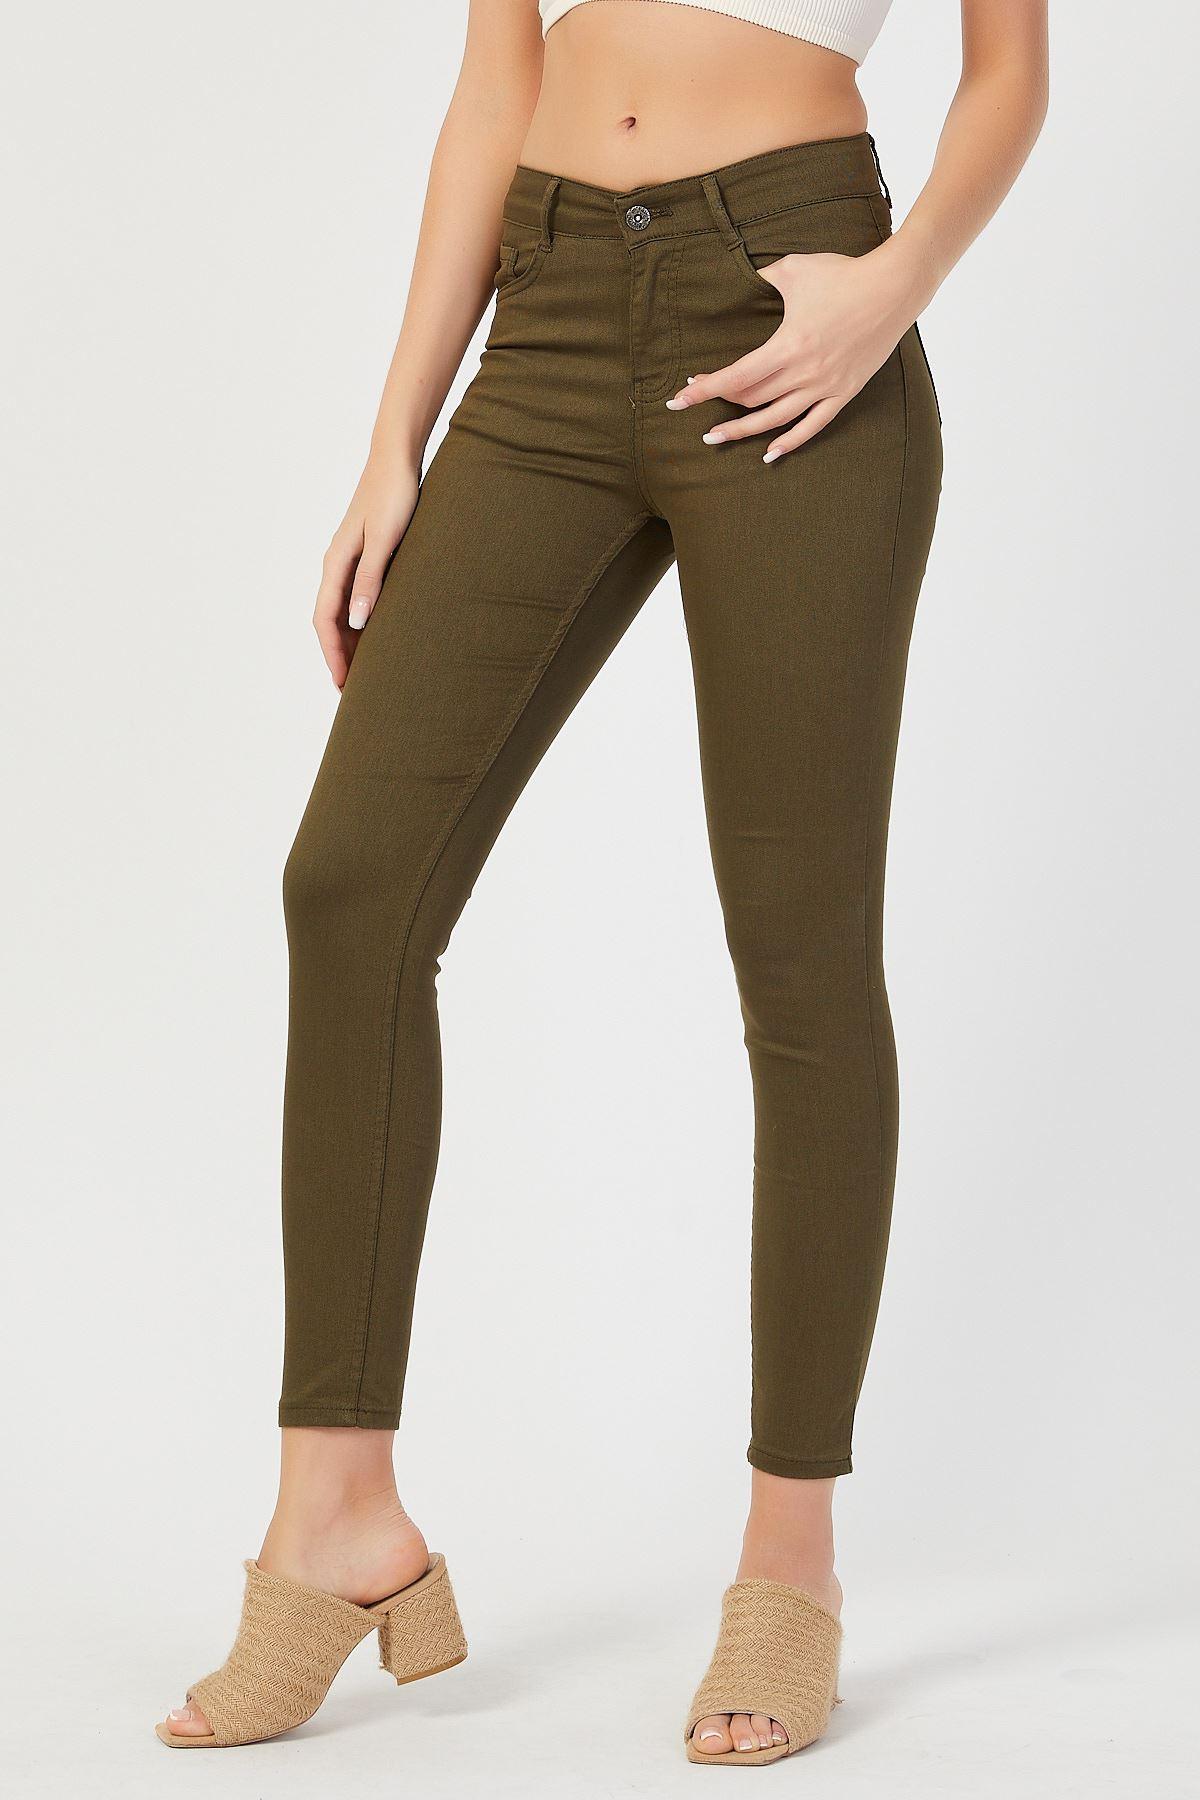 Yüksek Bel Keten Pantolon